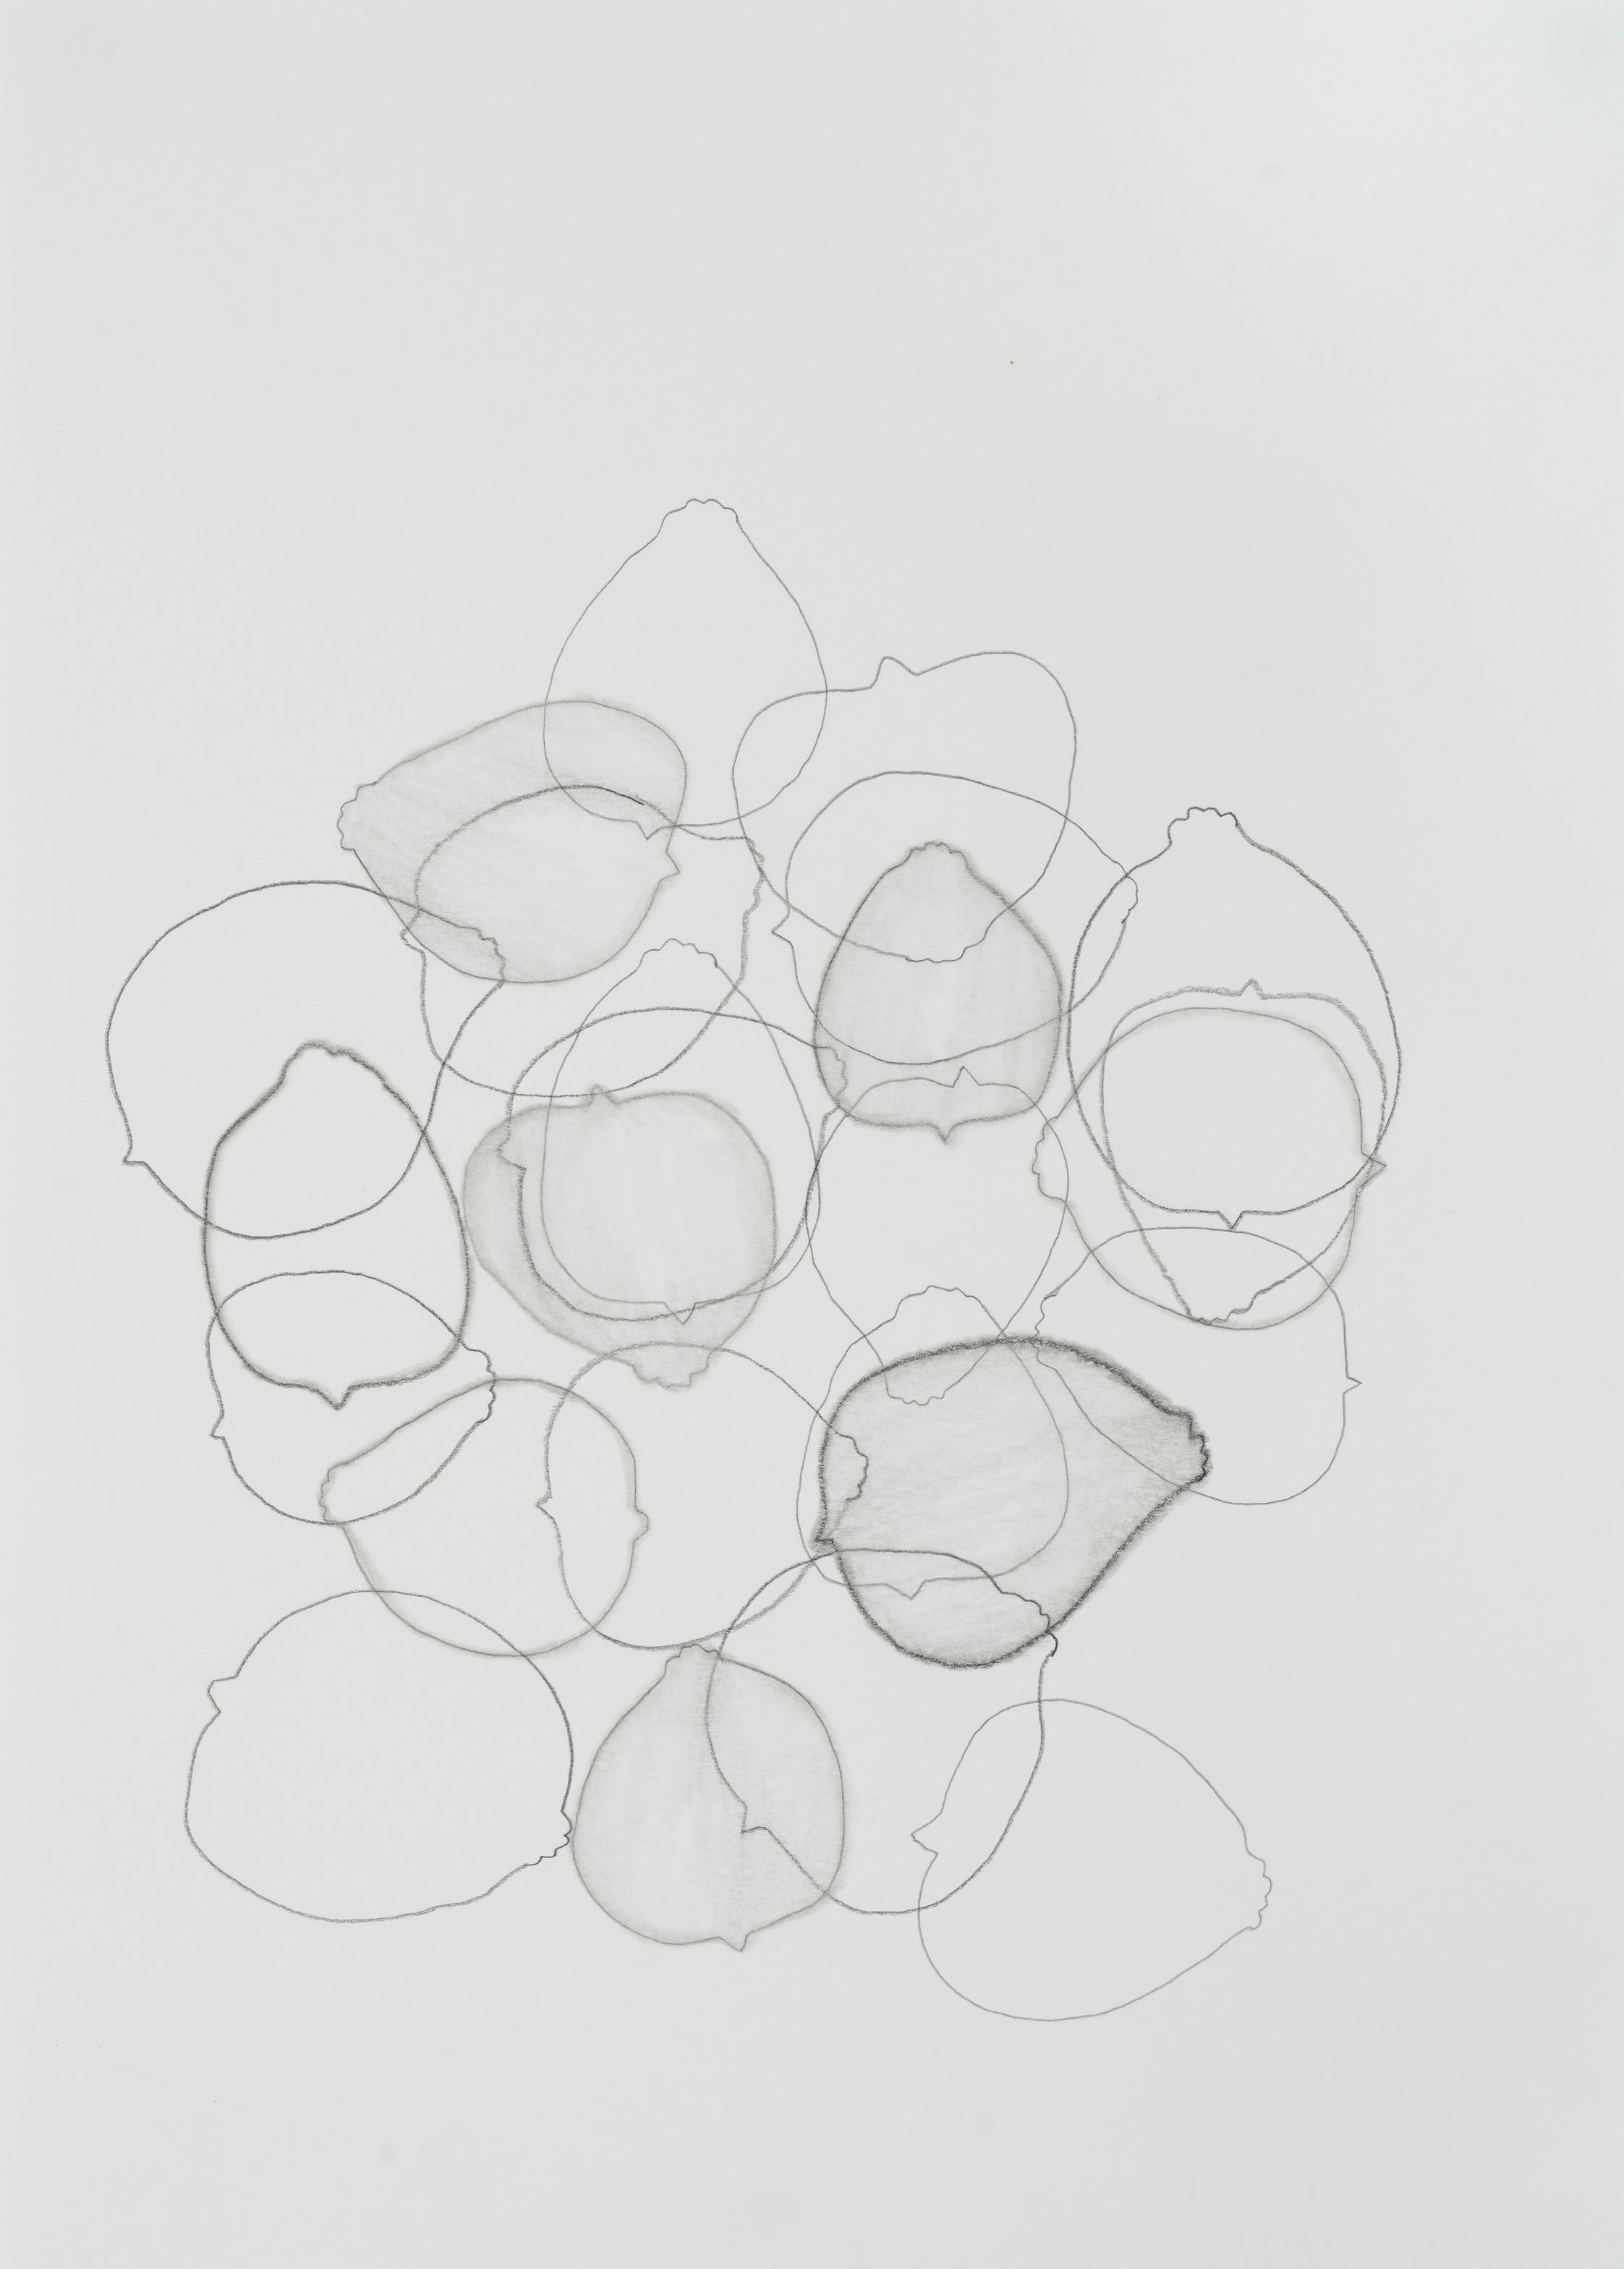 "subtle bodies | lemon (01), 2015 | graphite on paper | 11.5"" x 8.25"" | Private Collection, Oakland, CA"